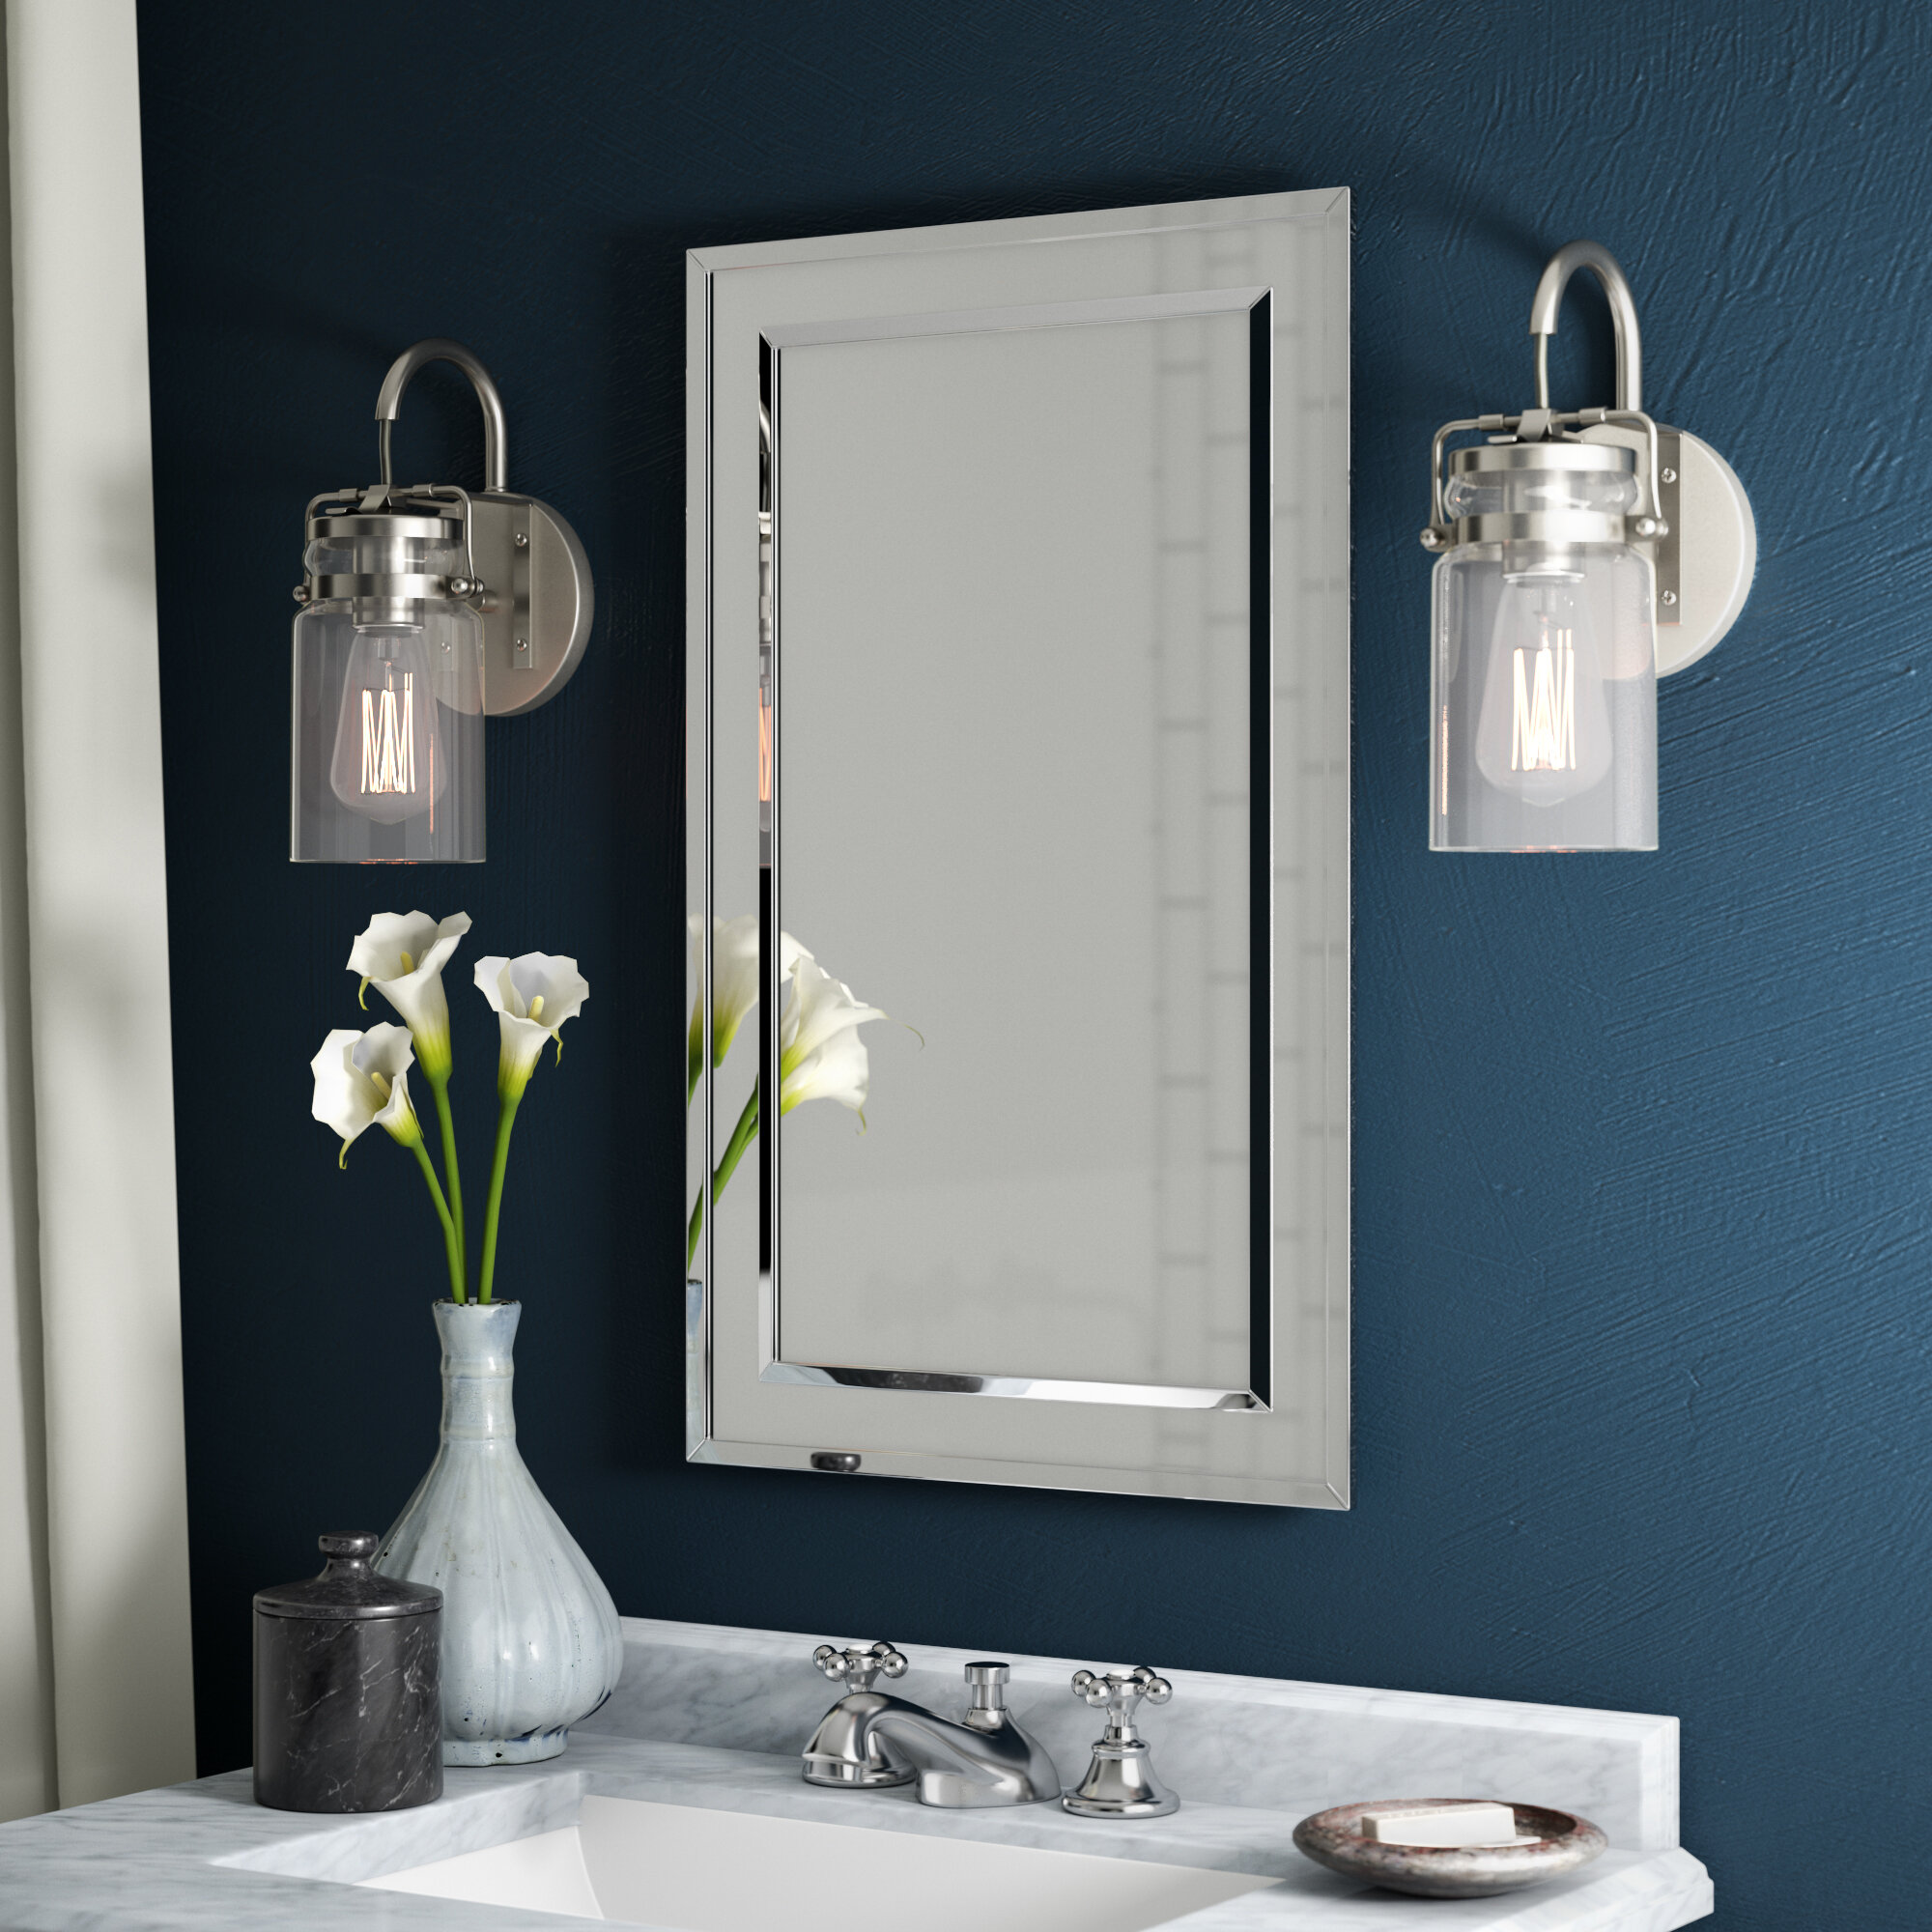 Enjoyable Graford 16 X 26 Recessed Medicine Cabinet With 2 Adjustable Shelves Download Free Architecture Designs Pendunizatbritishbridgeorg